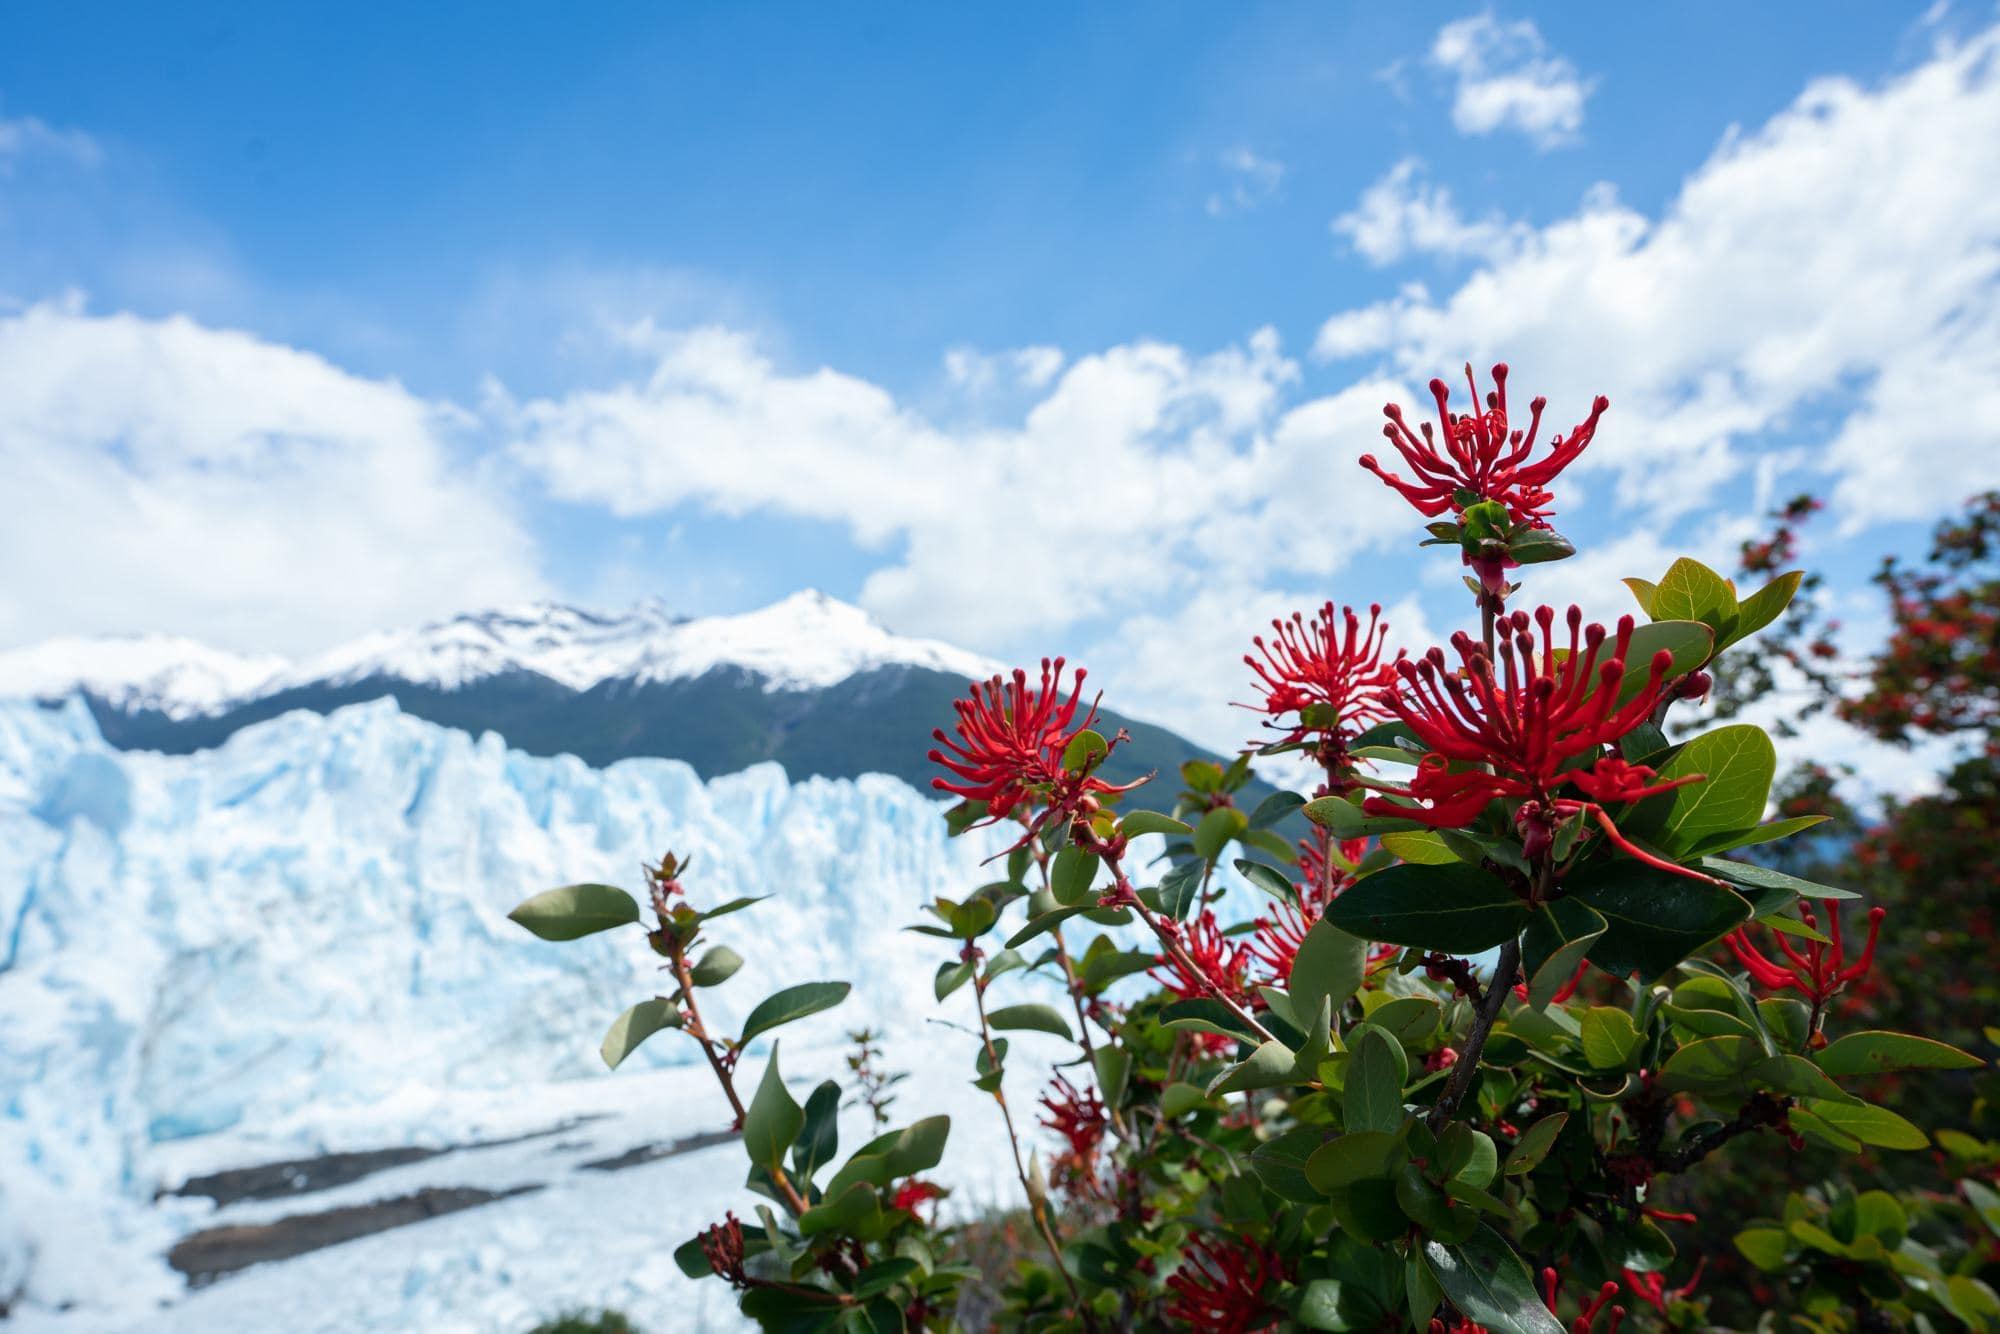 Exploring the Perito Moreno Glacier in Spring on a G Adventures tour